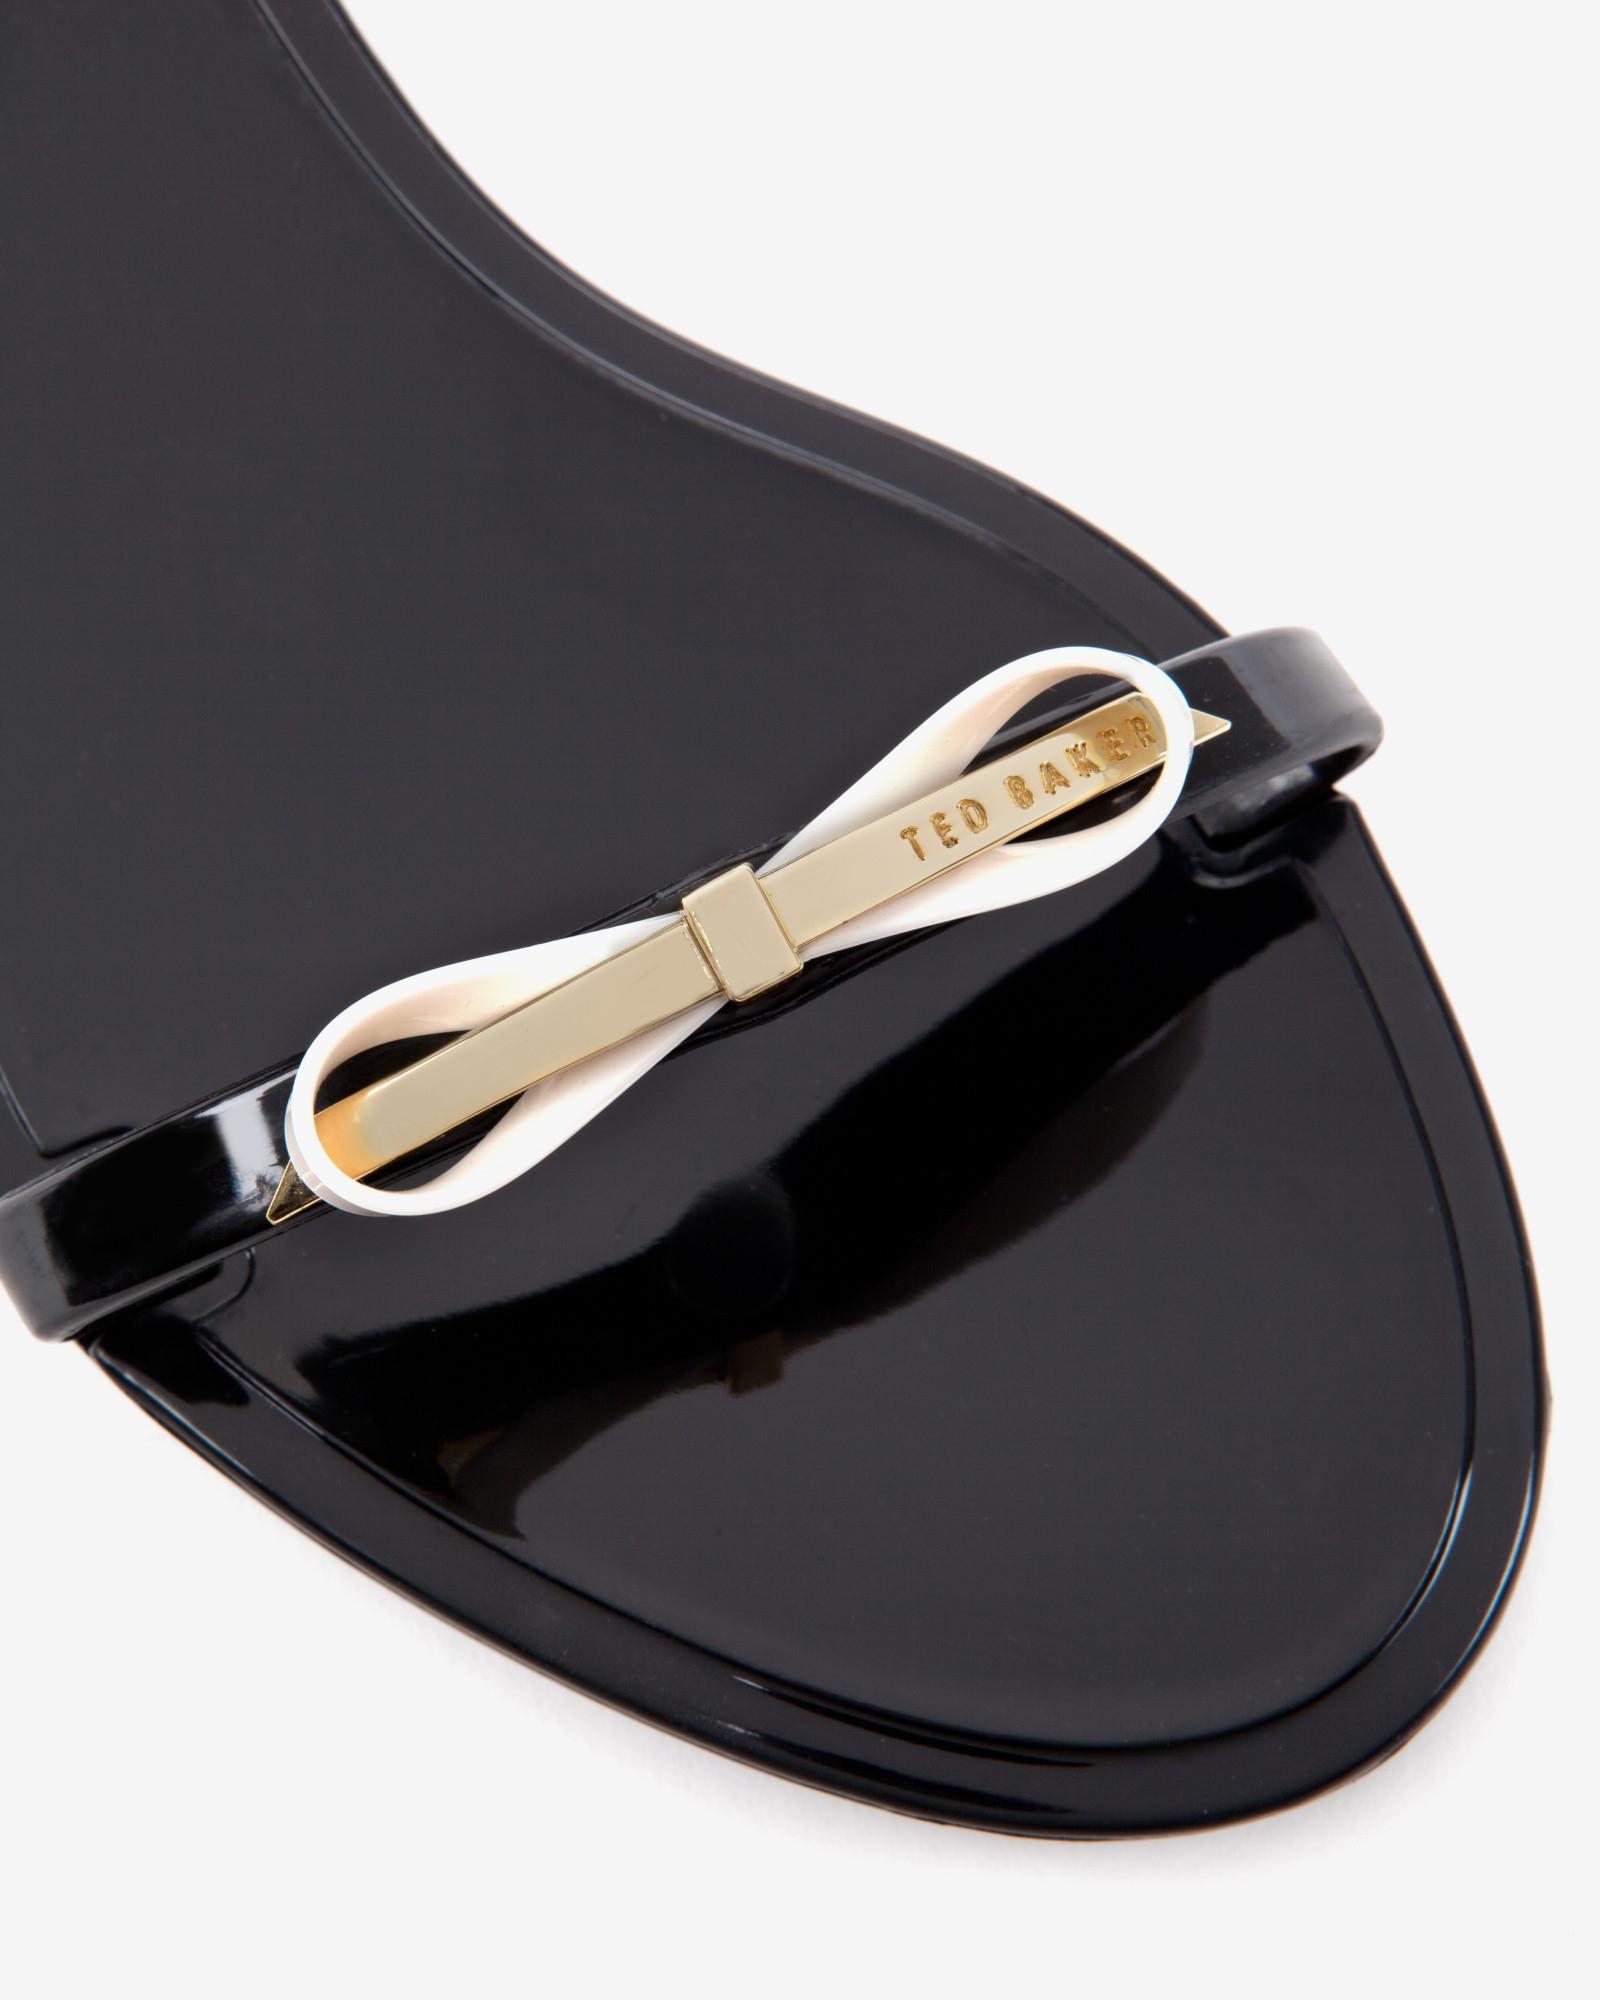 3de1b4d7e Lyst - Ted Baker Jelly Sandals in Black